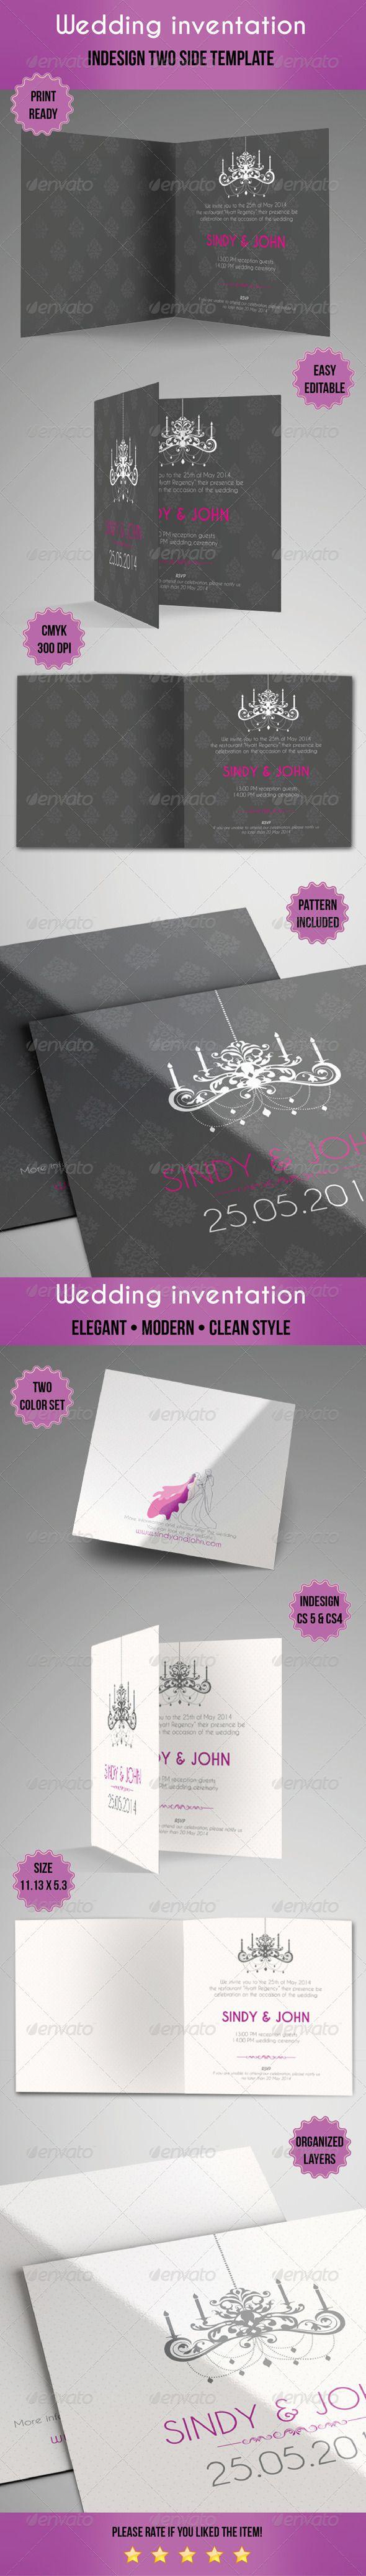 business event invitation templates%0A Wedding Invitation  Pinterest Wedding InvitationsPrintable Wedding InvitationsInvitation  TemplatesCard